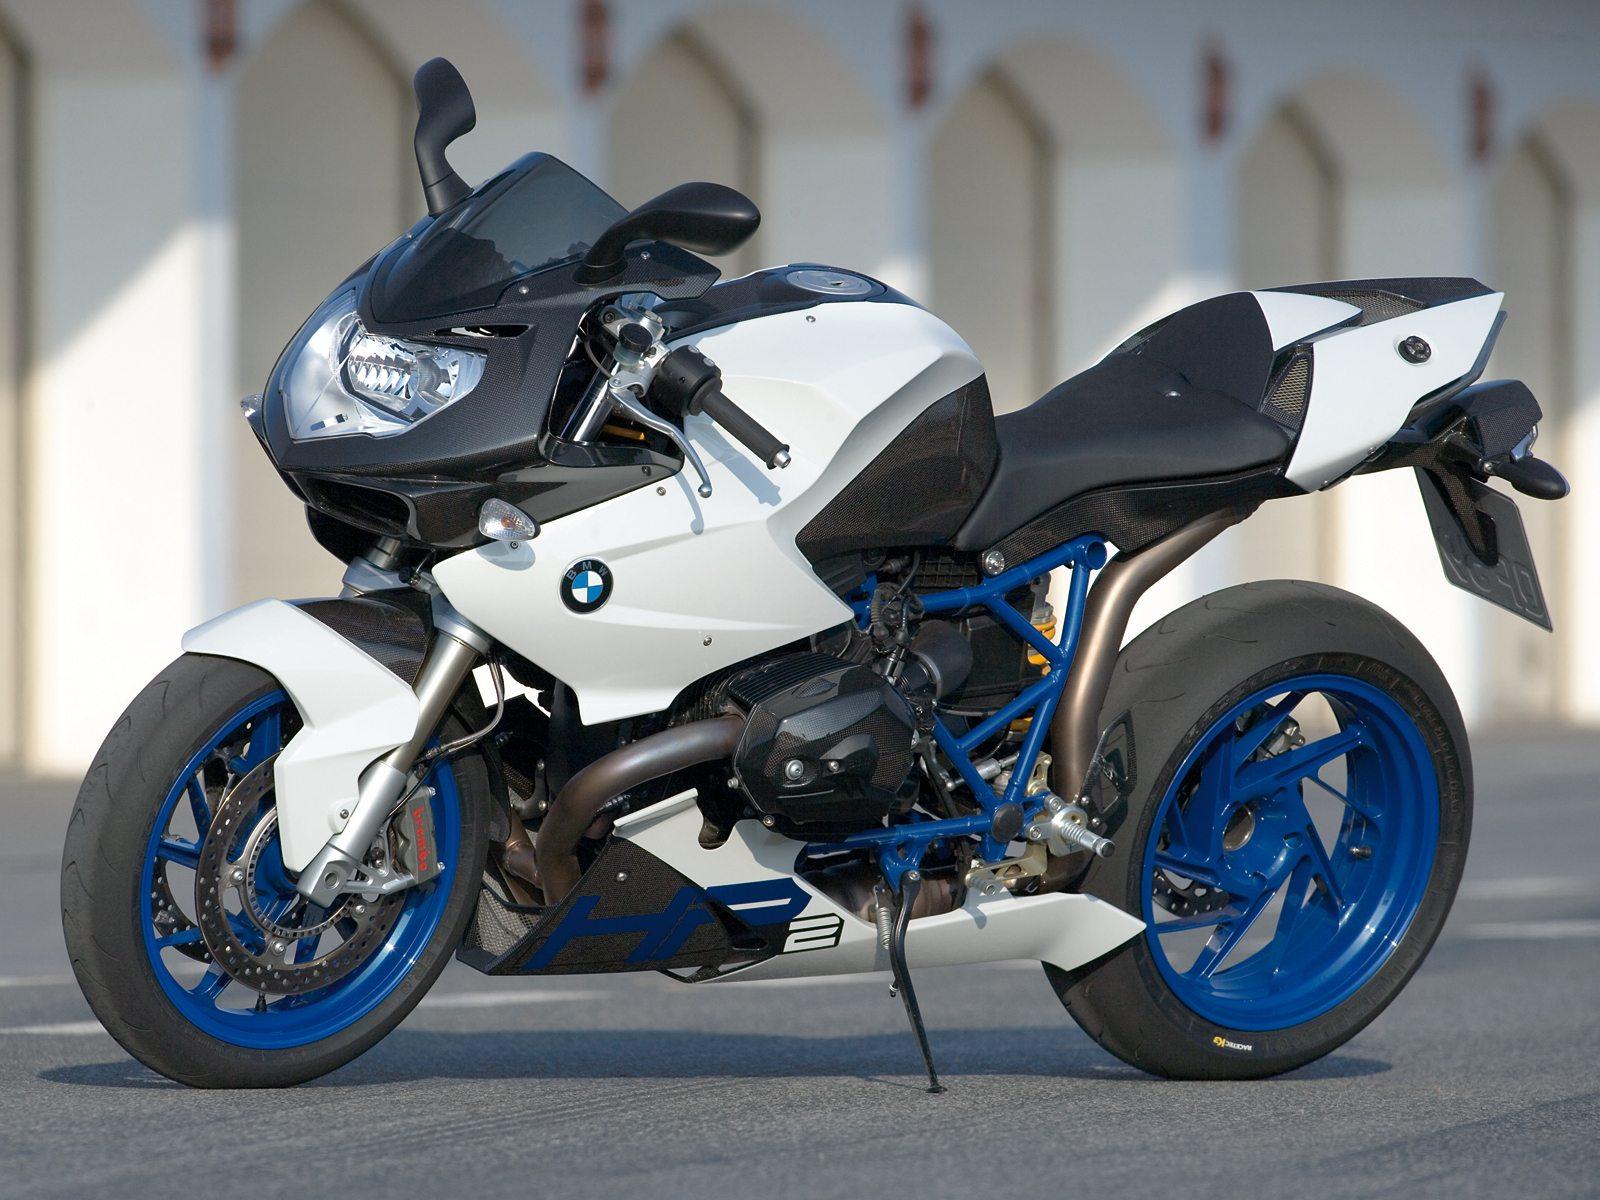 2008 BMW HP2 Sport Motorcycle Desktop Wallpaper